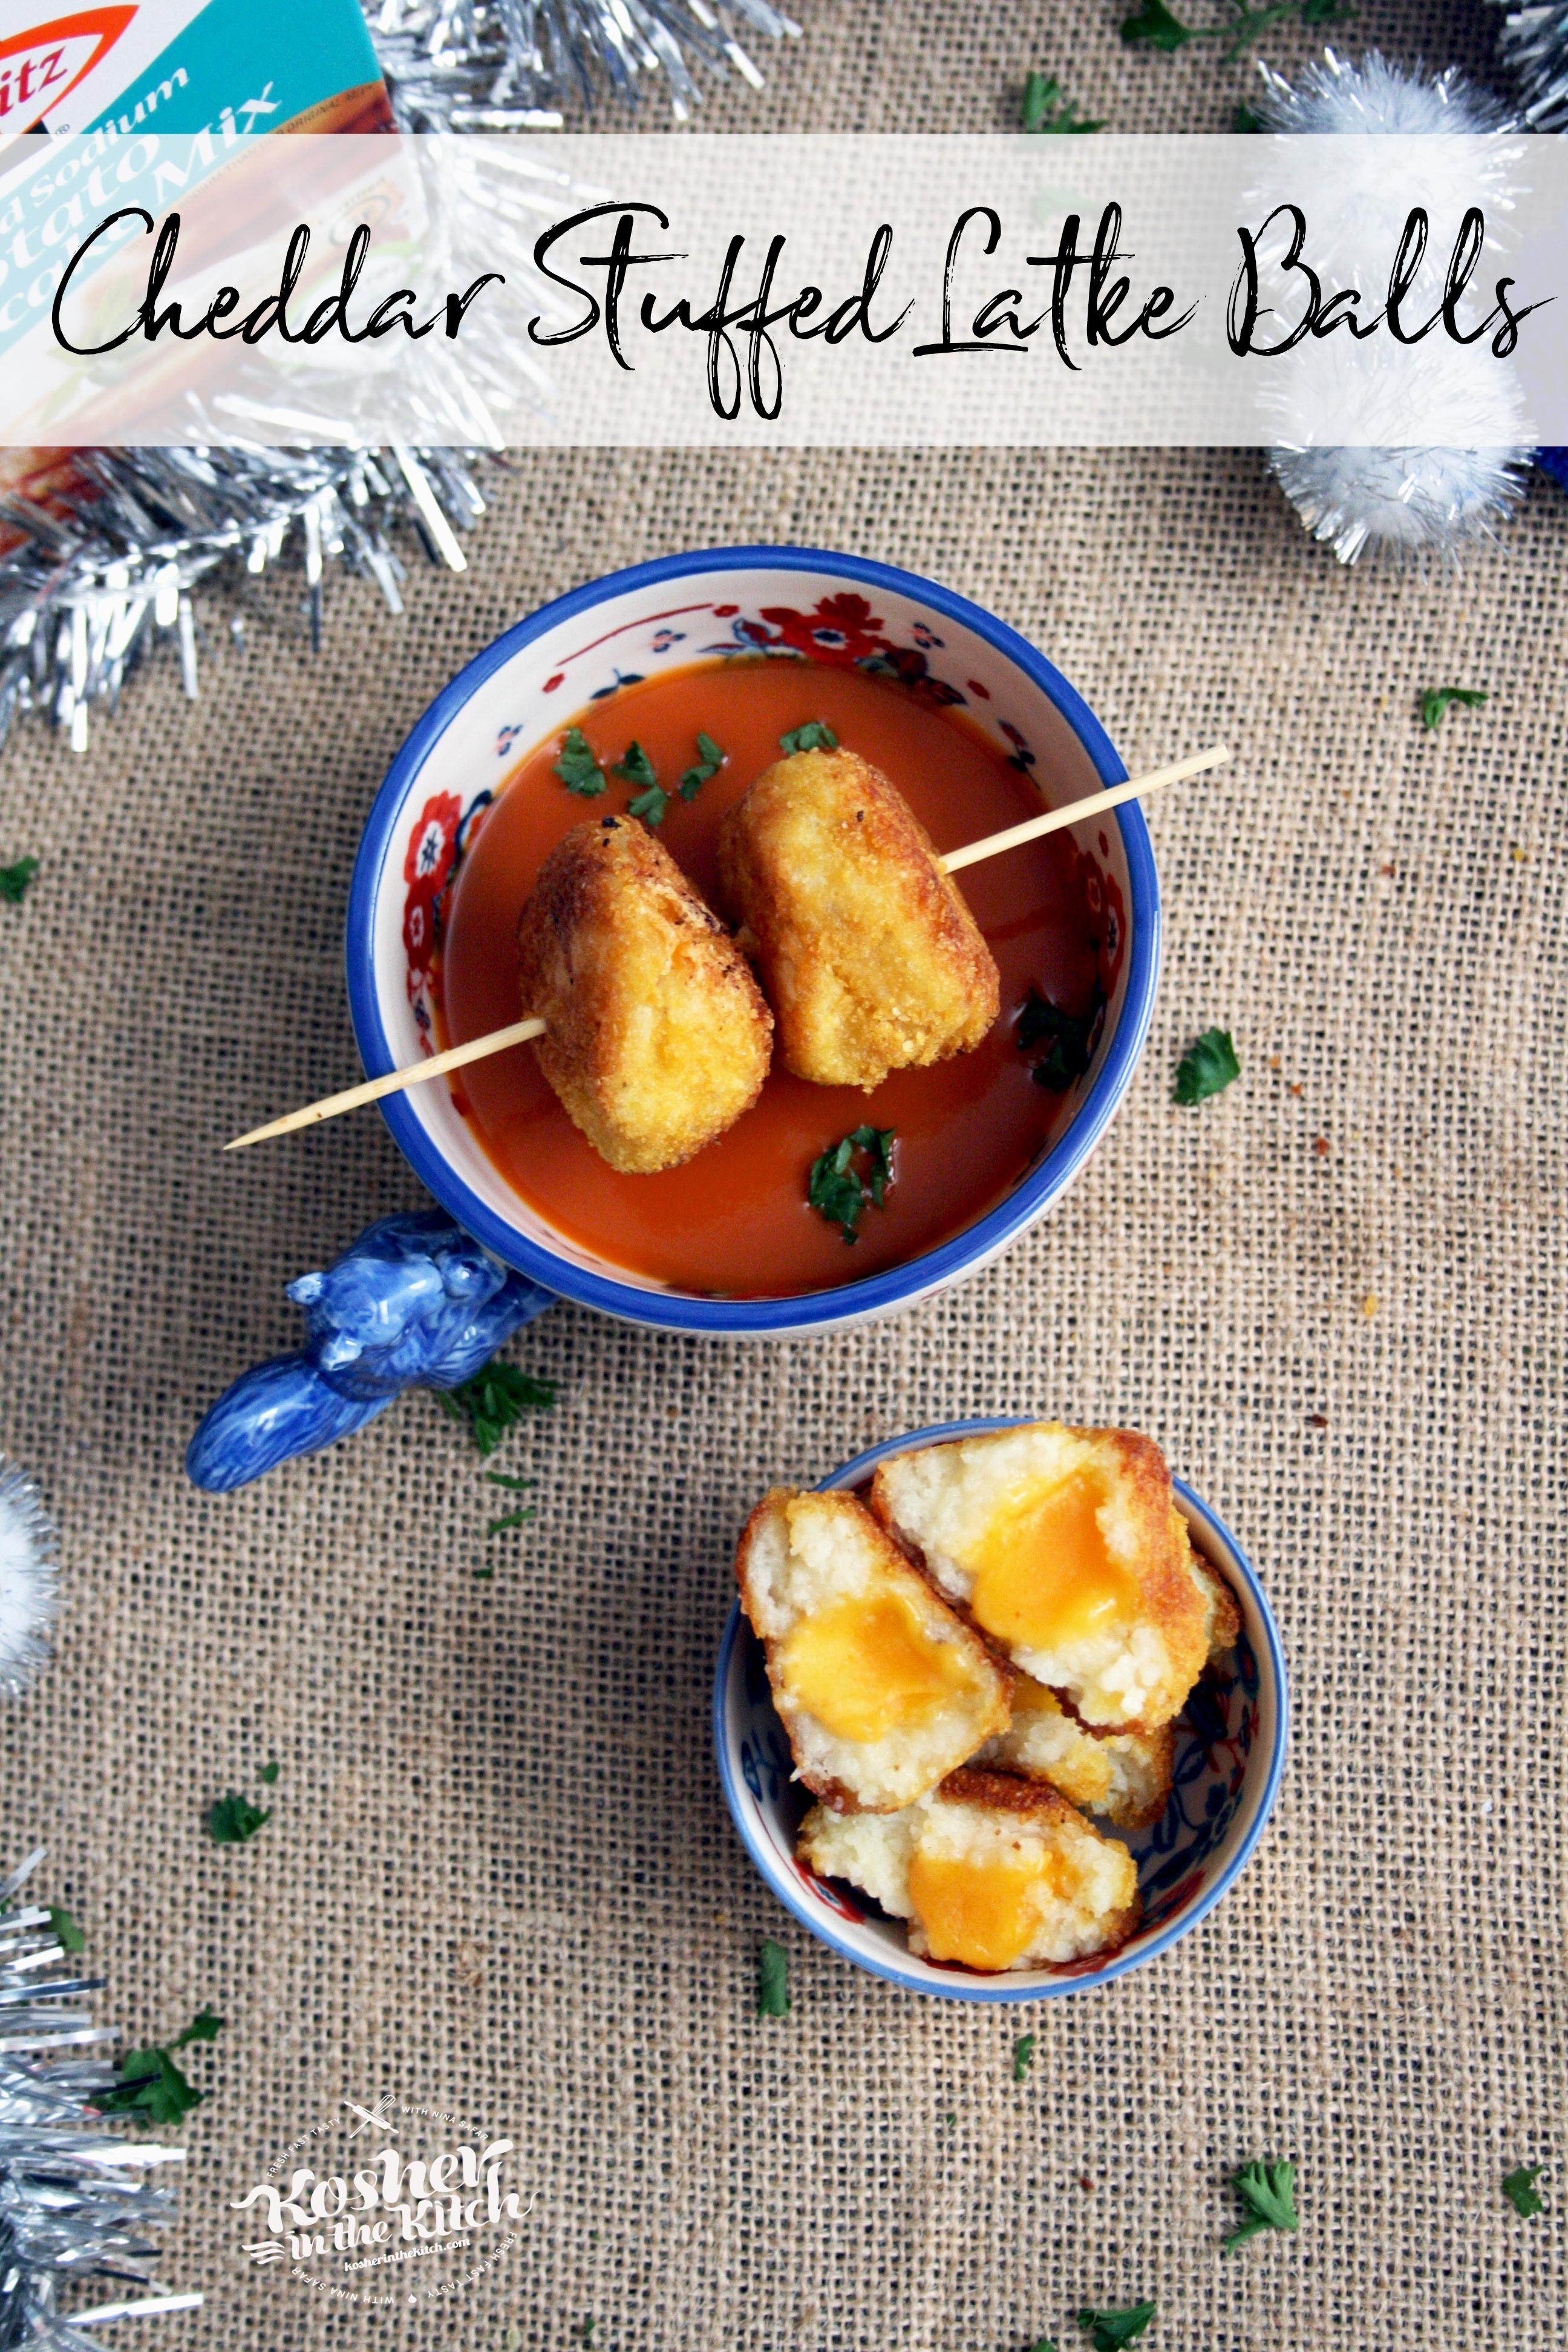 Cheddar Stuffed Latke Balls and Tomato Soup